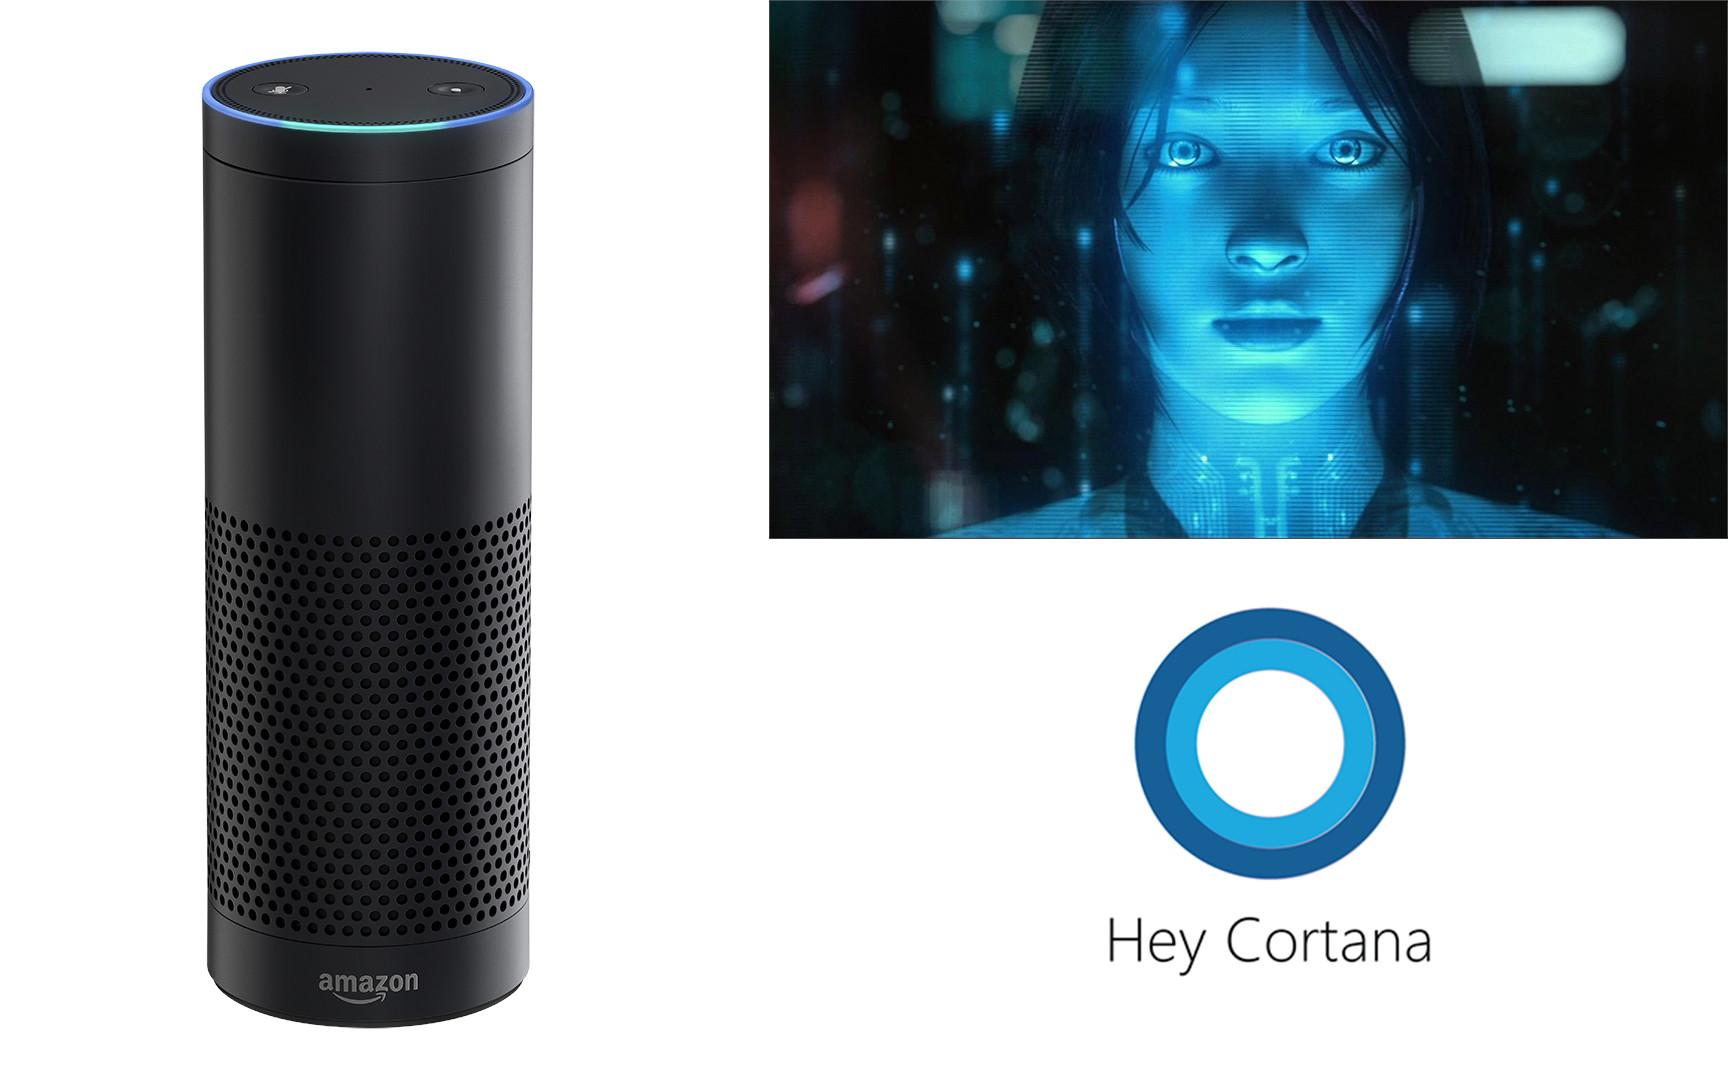 Alexa and Cortana Virtually Shaking Hands In A Partnership